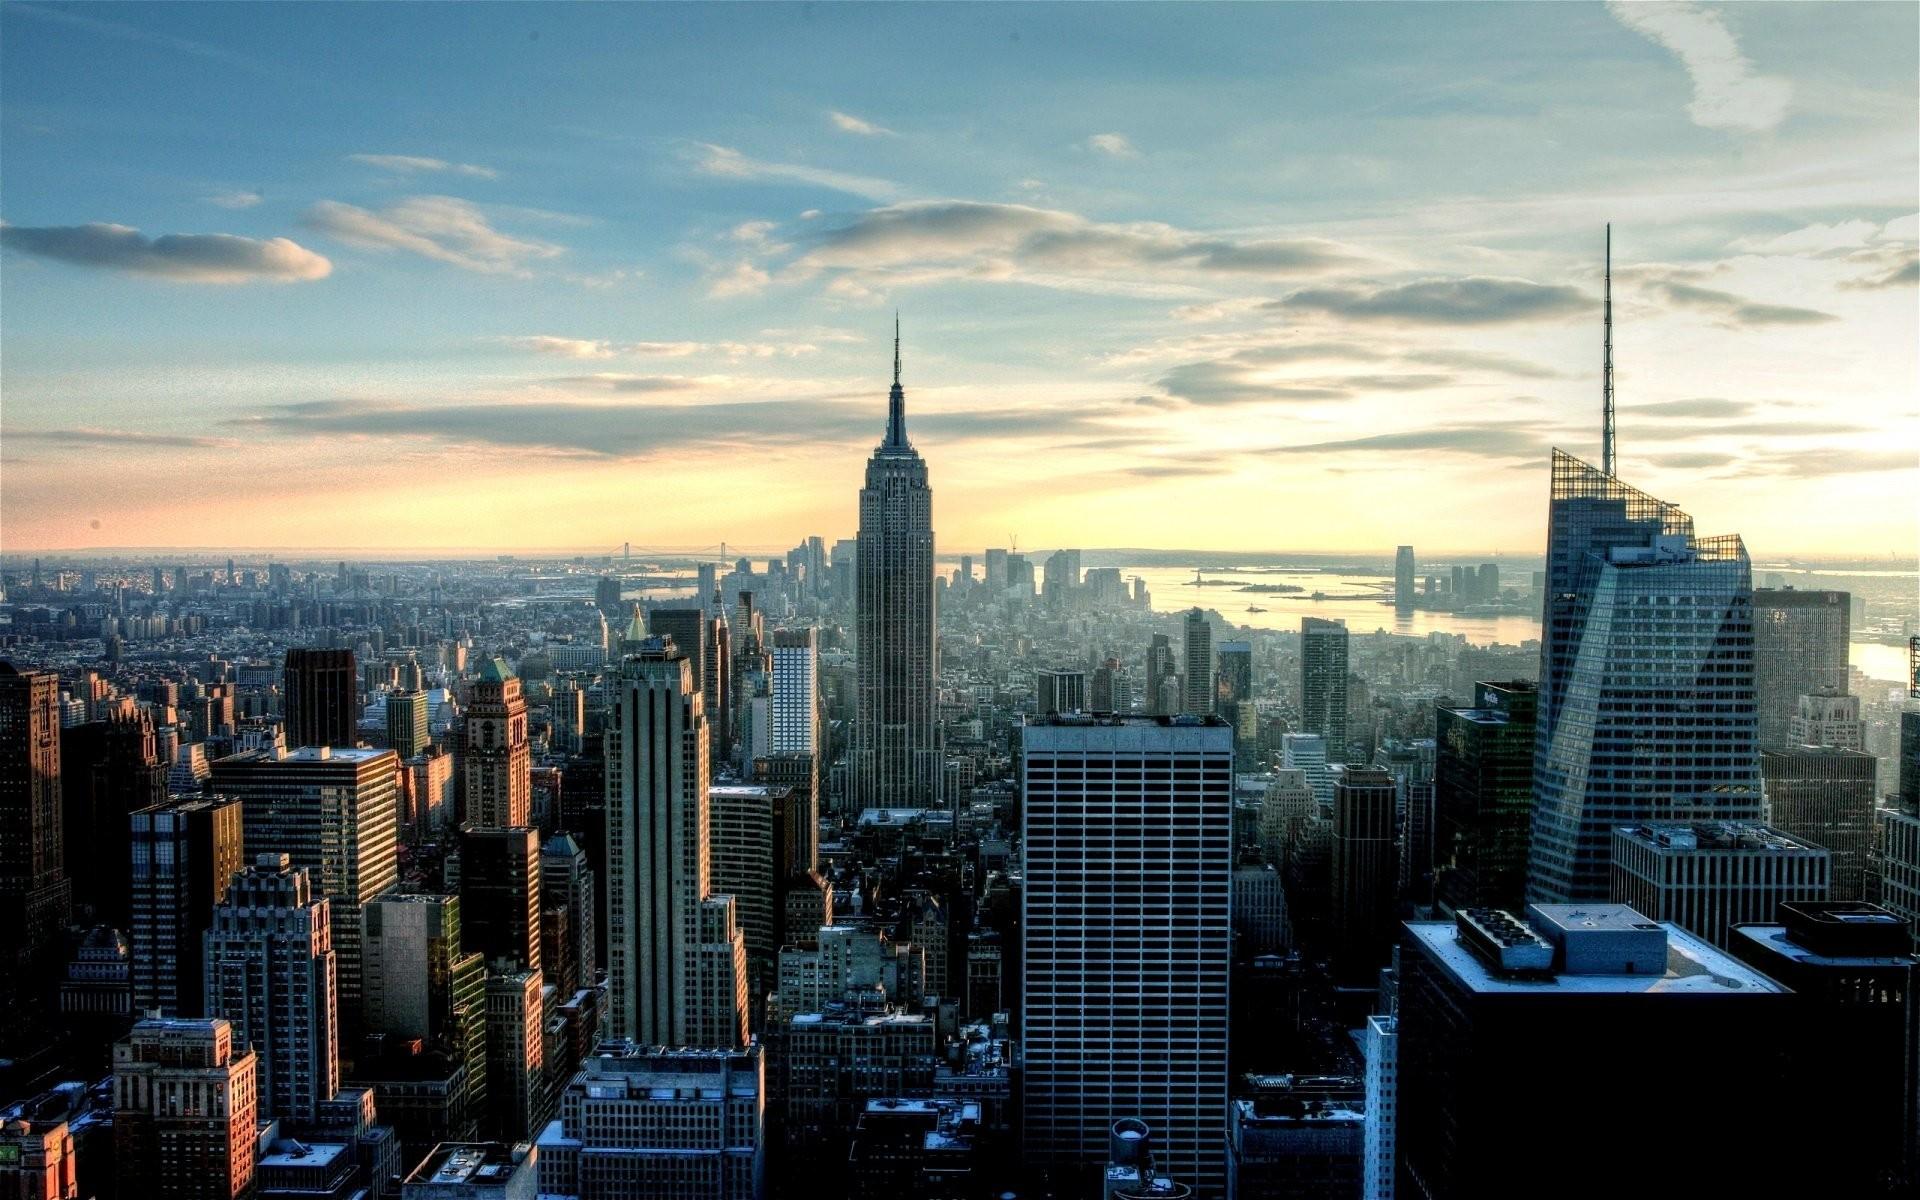 New York City Skyline Wallpapers | wallpaper, wallpaper hd, background .